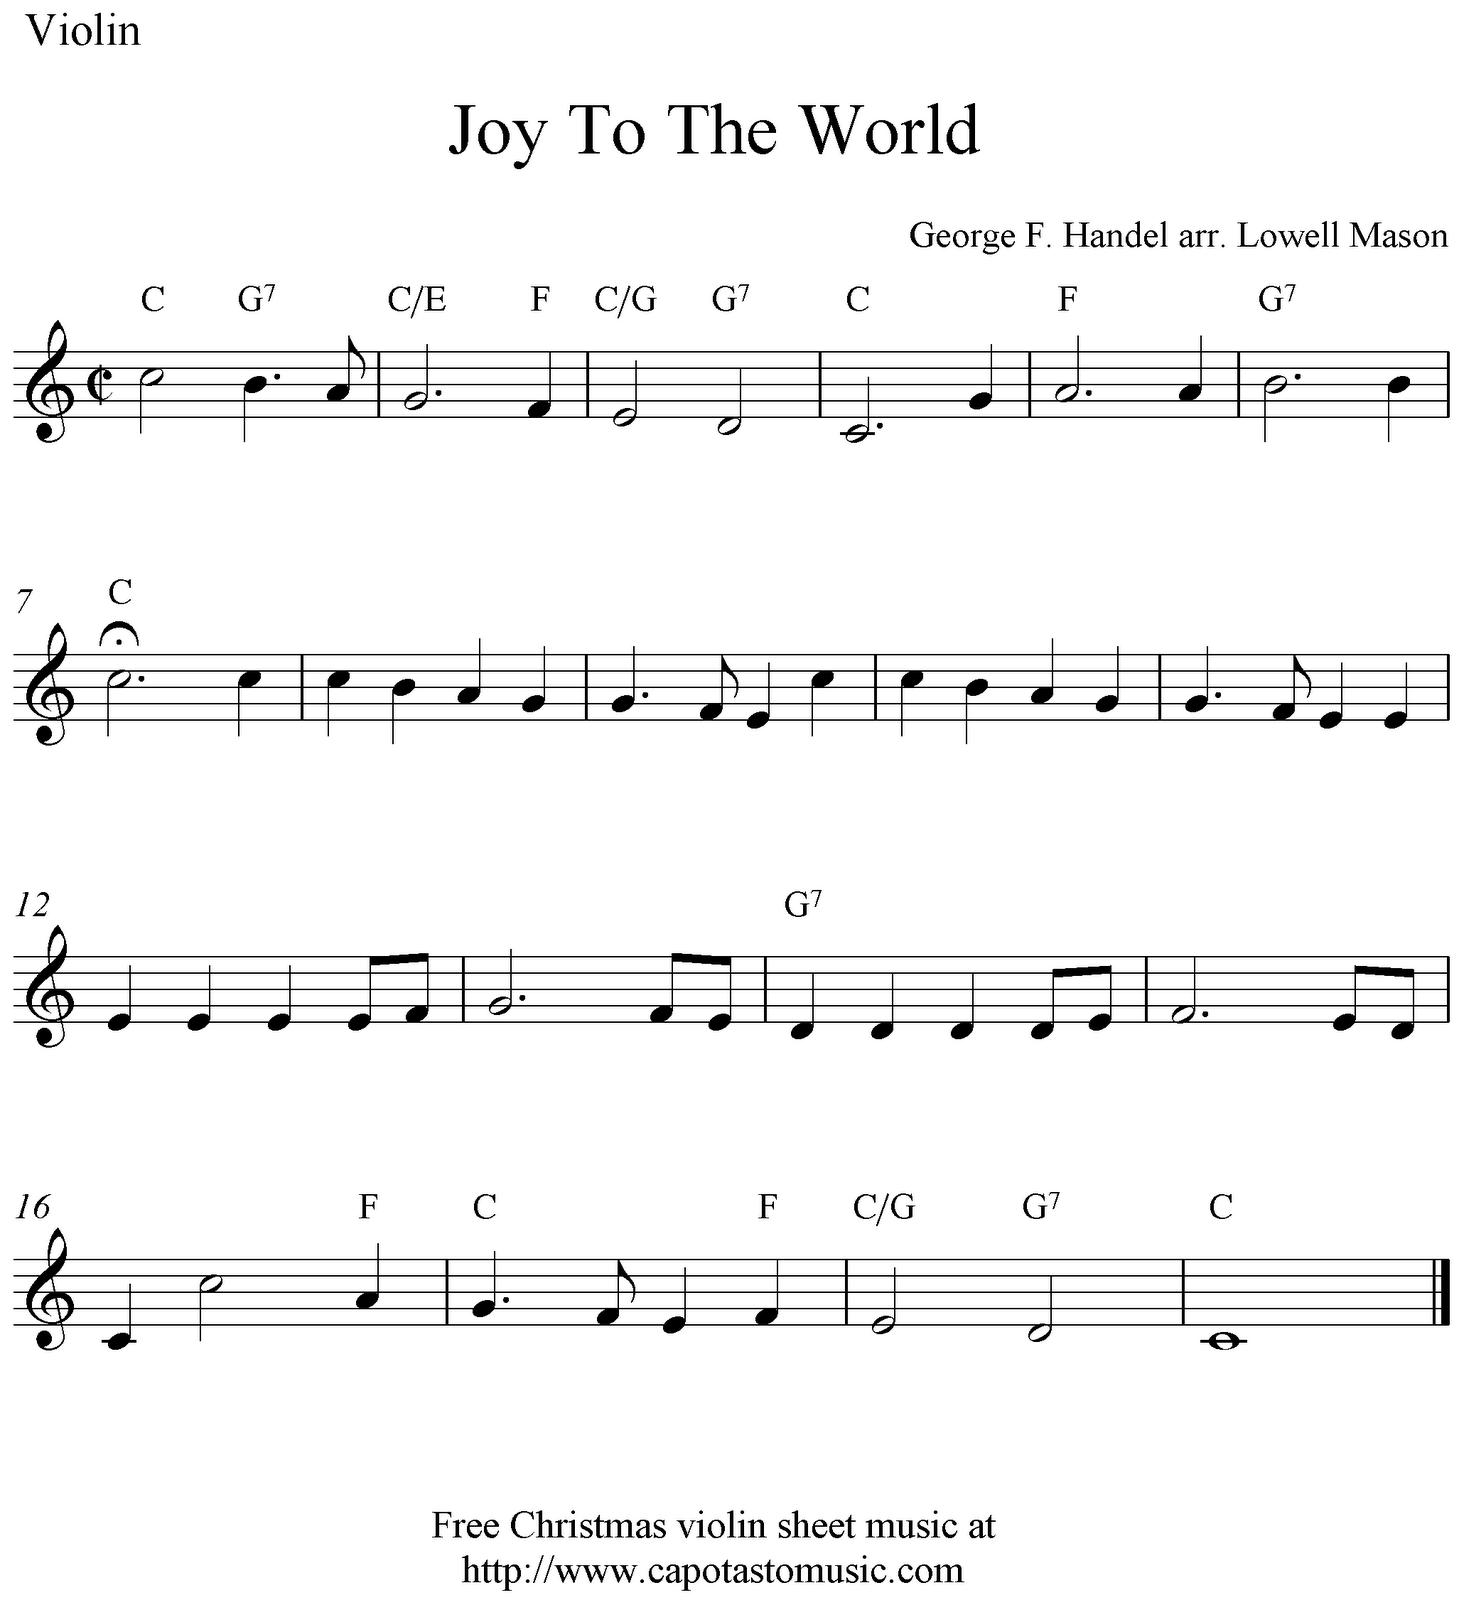 sheet music violin : Joy To The World, free Christmas violin sheet music notes : Violin ...